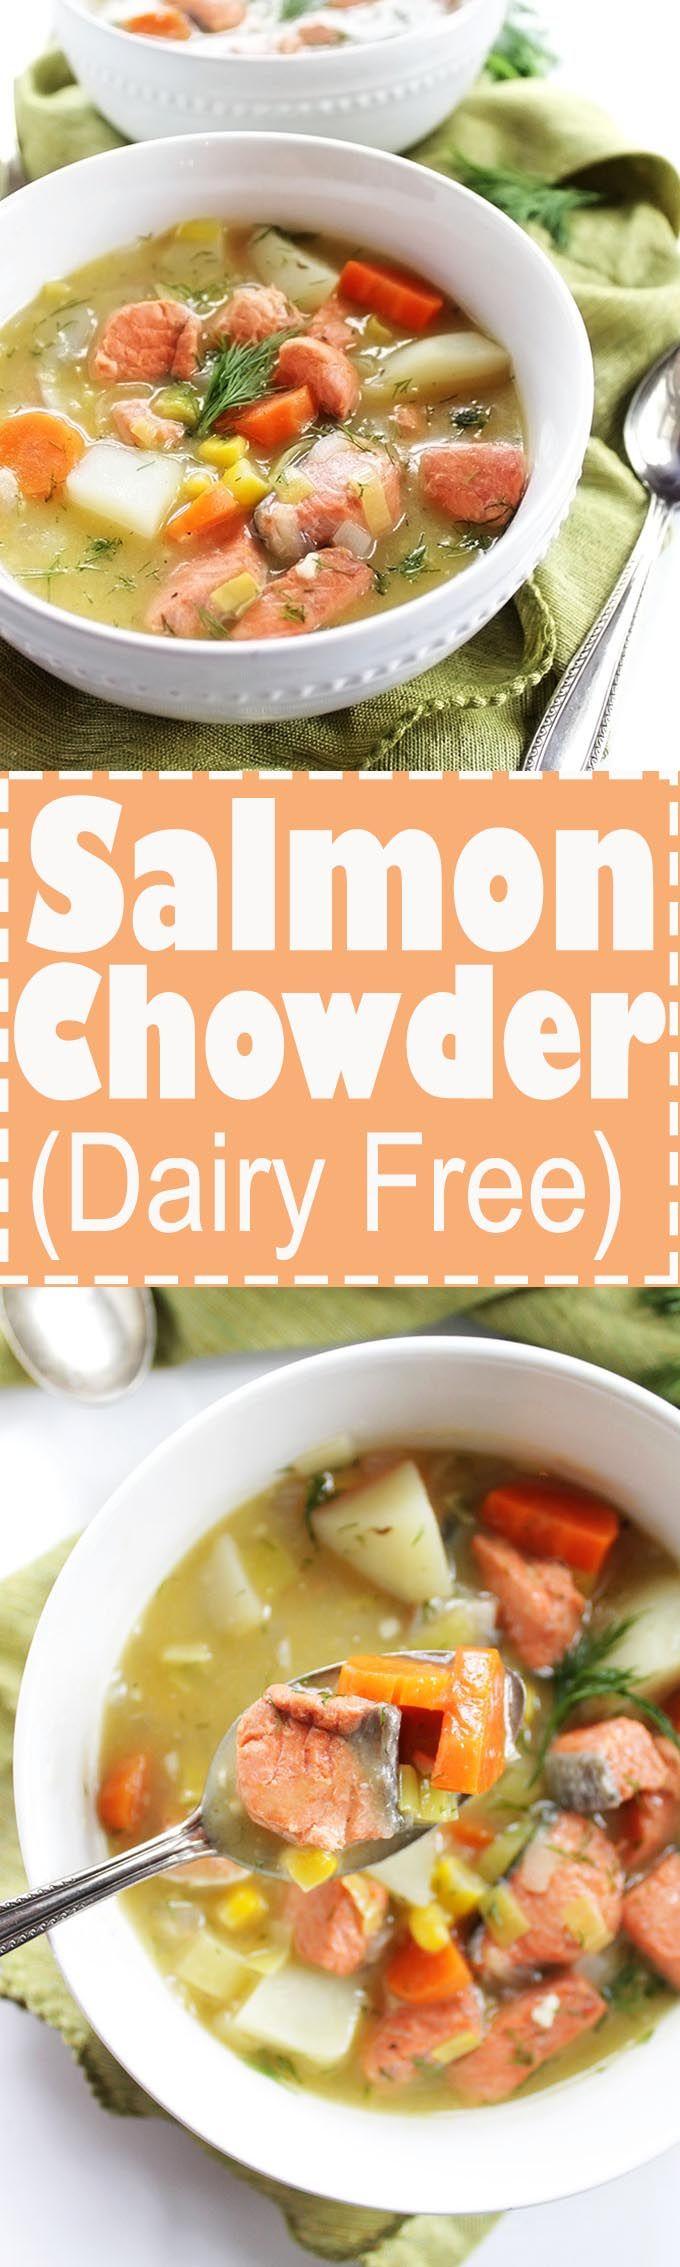 Dairy Free Salmon Chowder (gf)